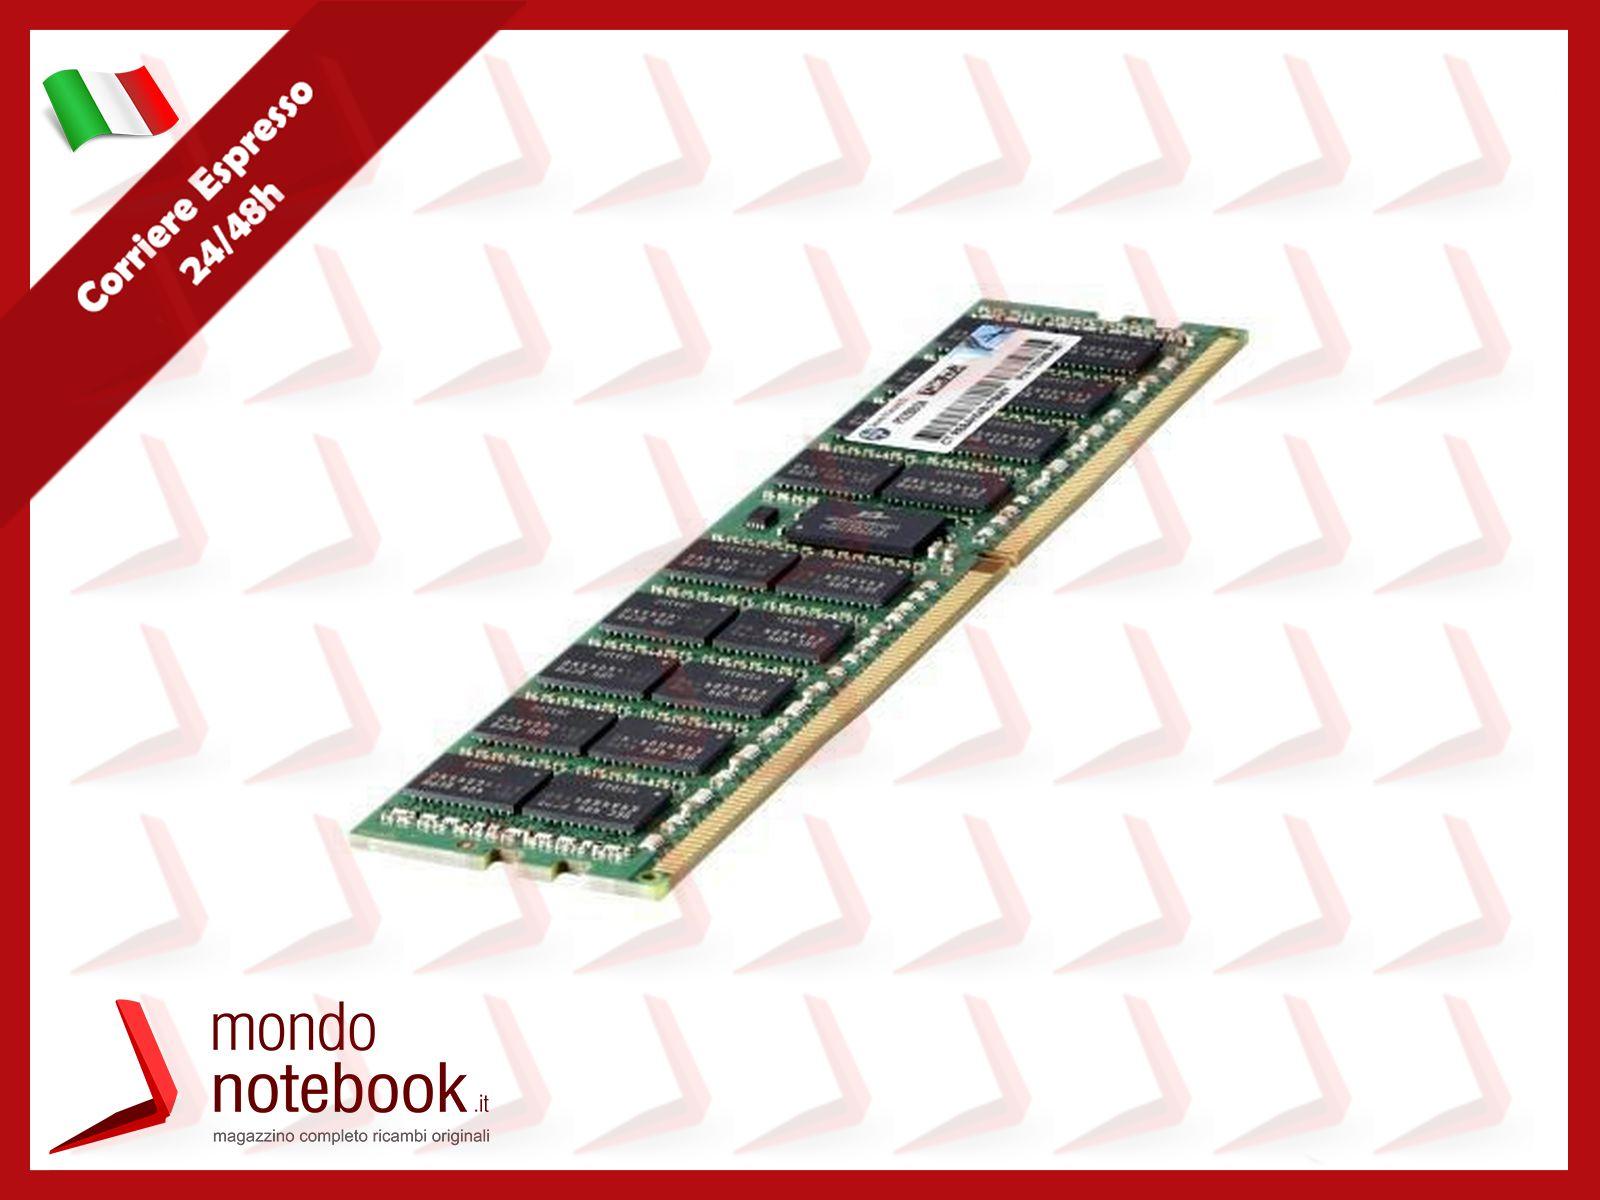 https://www.mondonotebook.it/11818/cavo-connettore-hard-disk-hdd-sata-hp-envy-15-ae-15-ah-m6-m6-p-15-t-15t-a-nbx000.jpg